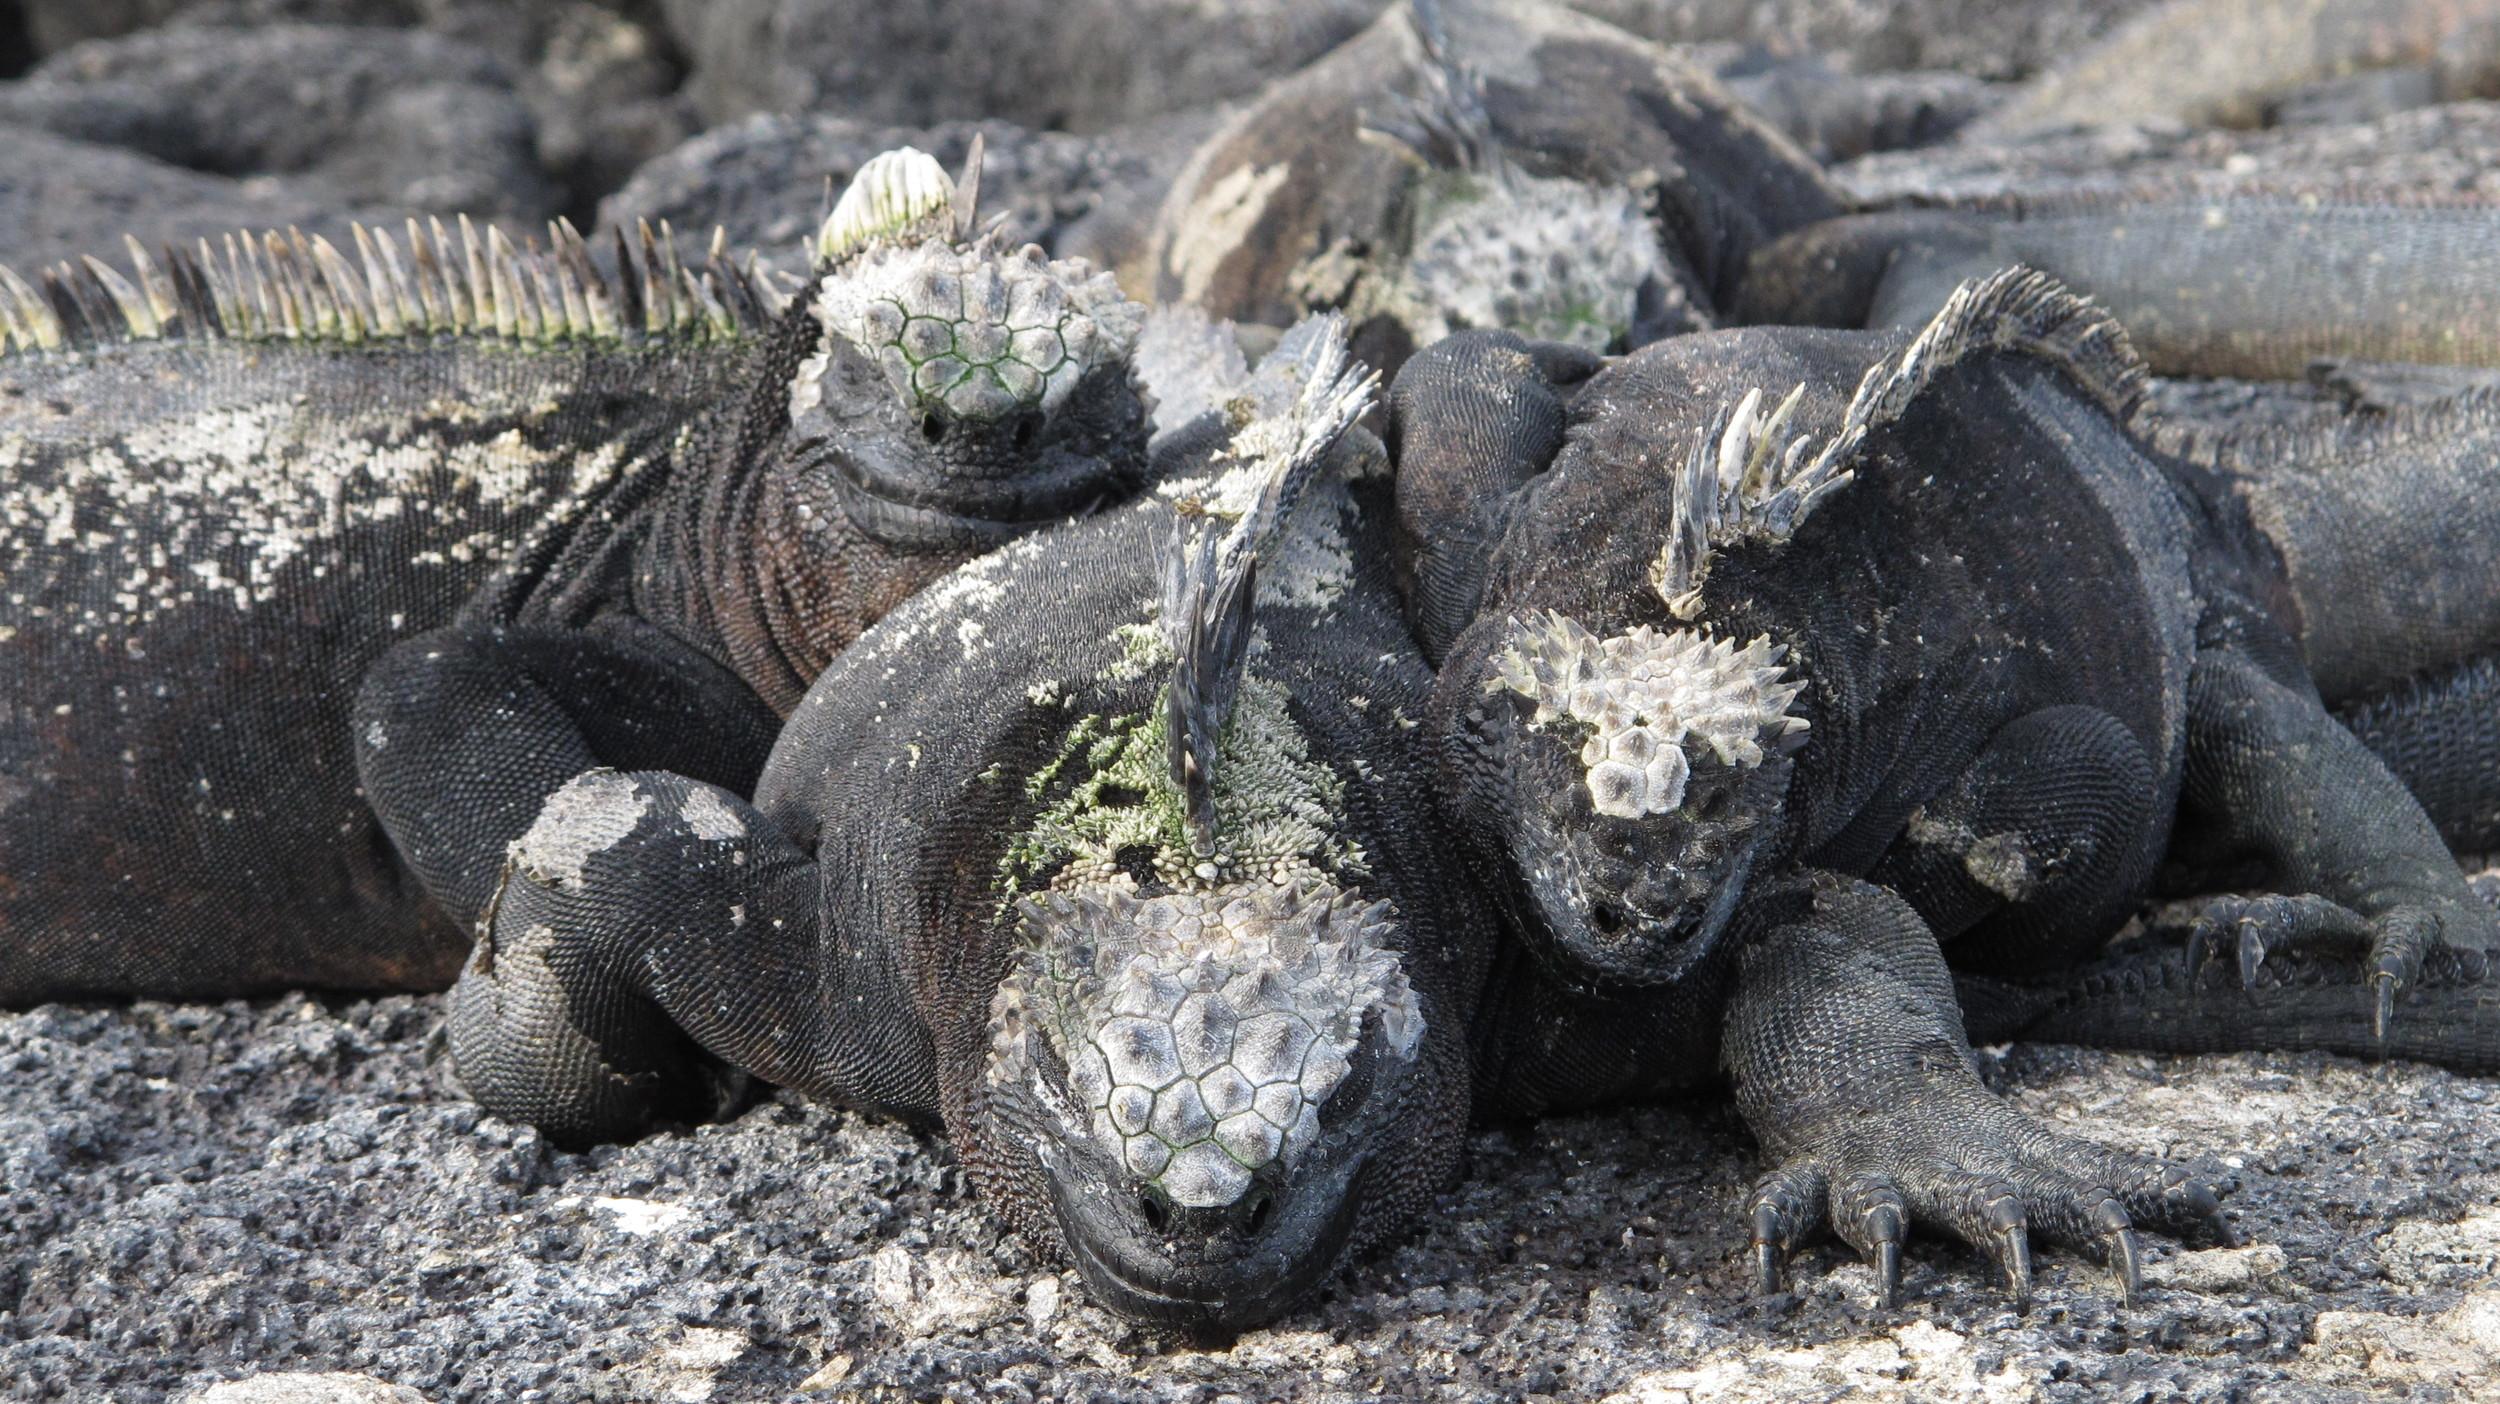 Fernandina subspecies A. c. cristatus blends easily into the volcanic rock. Photo: Alan Abonyi